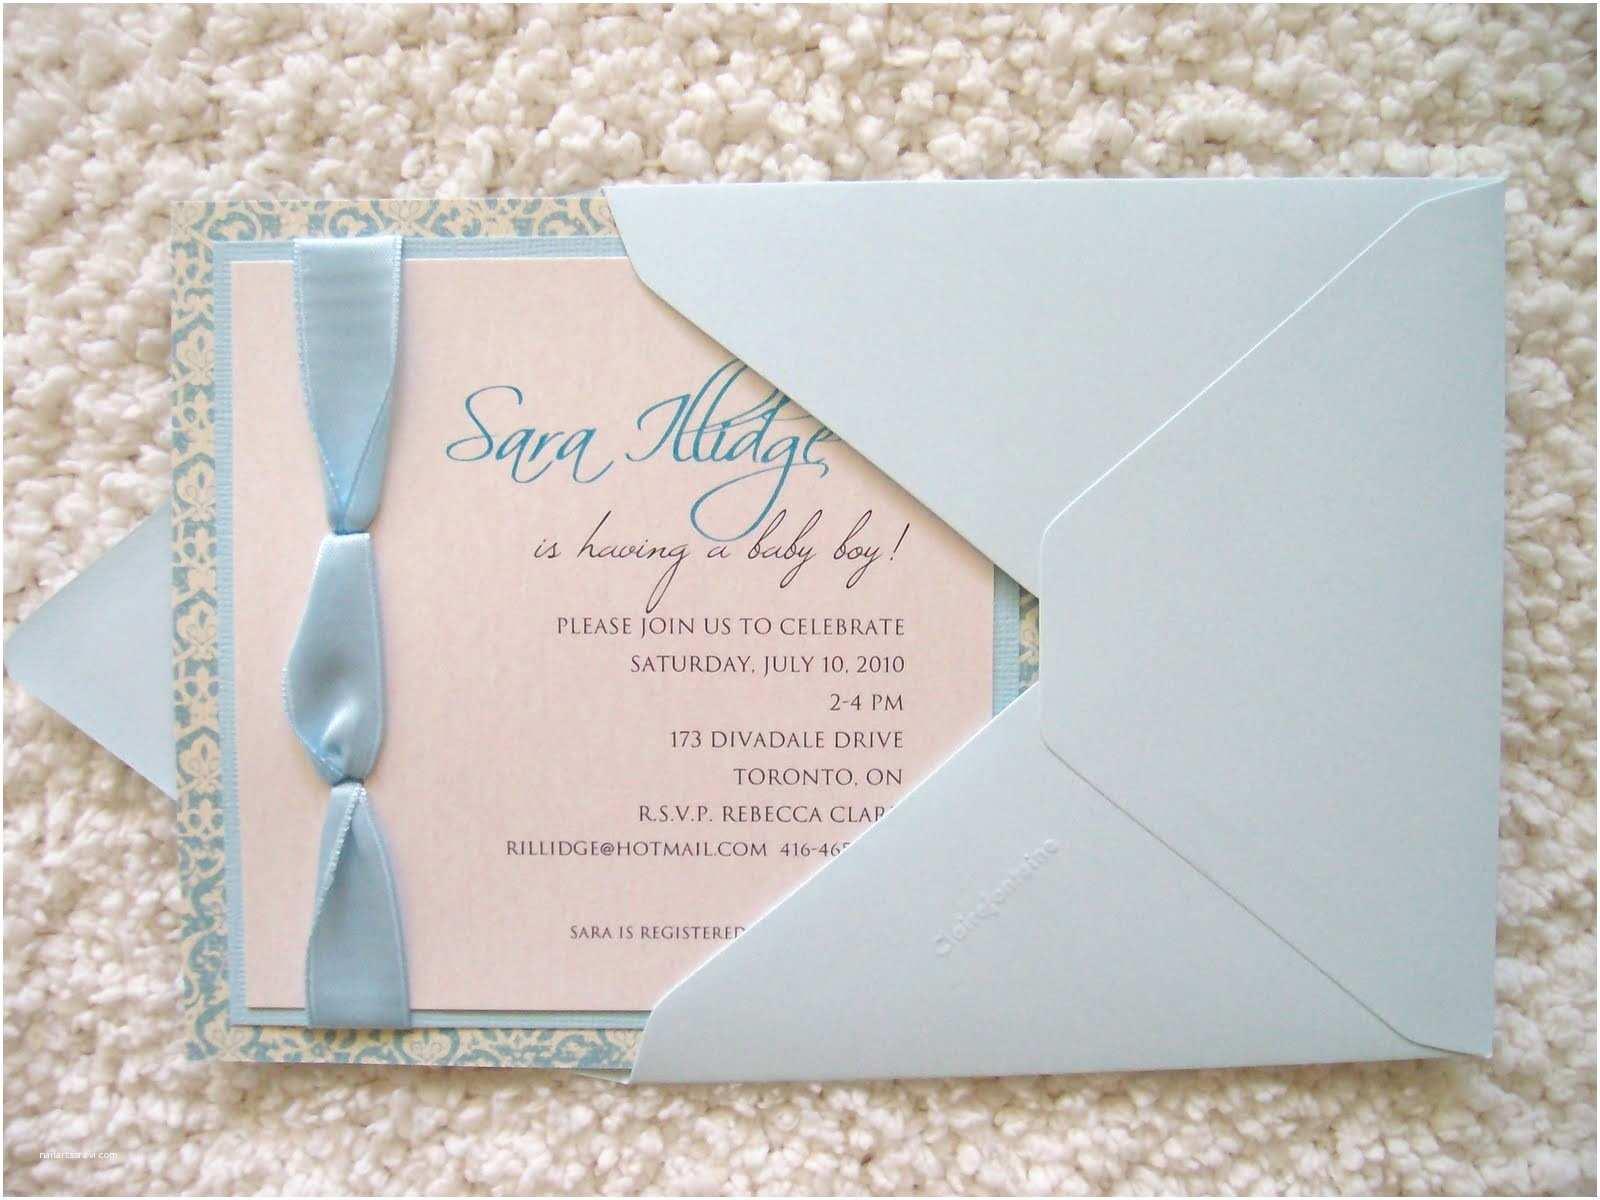 Elegant Baby Shower Invitations Invitation for Baby Shower Captivating Elegant Baby